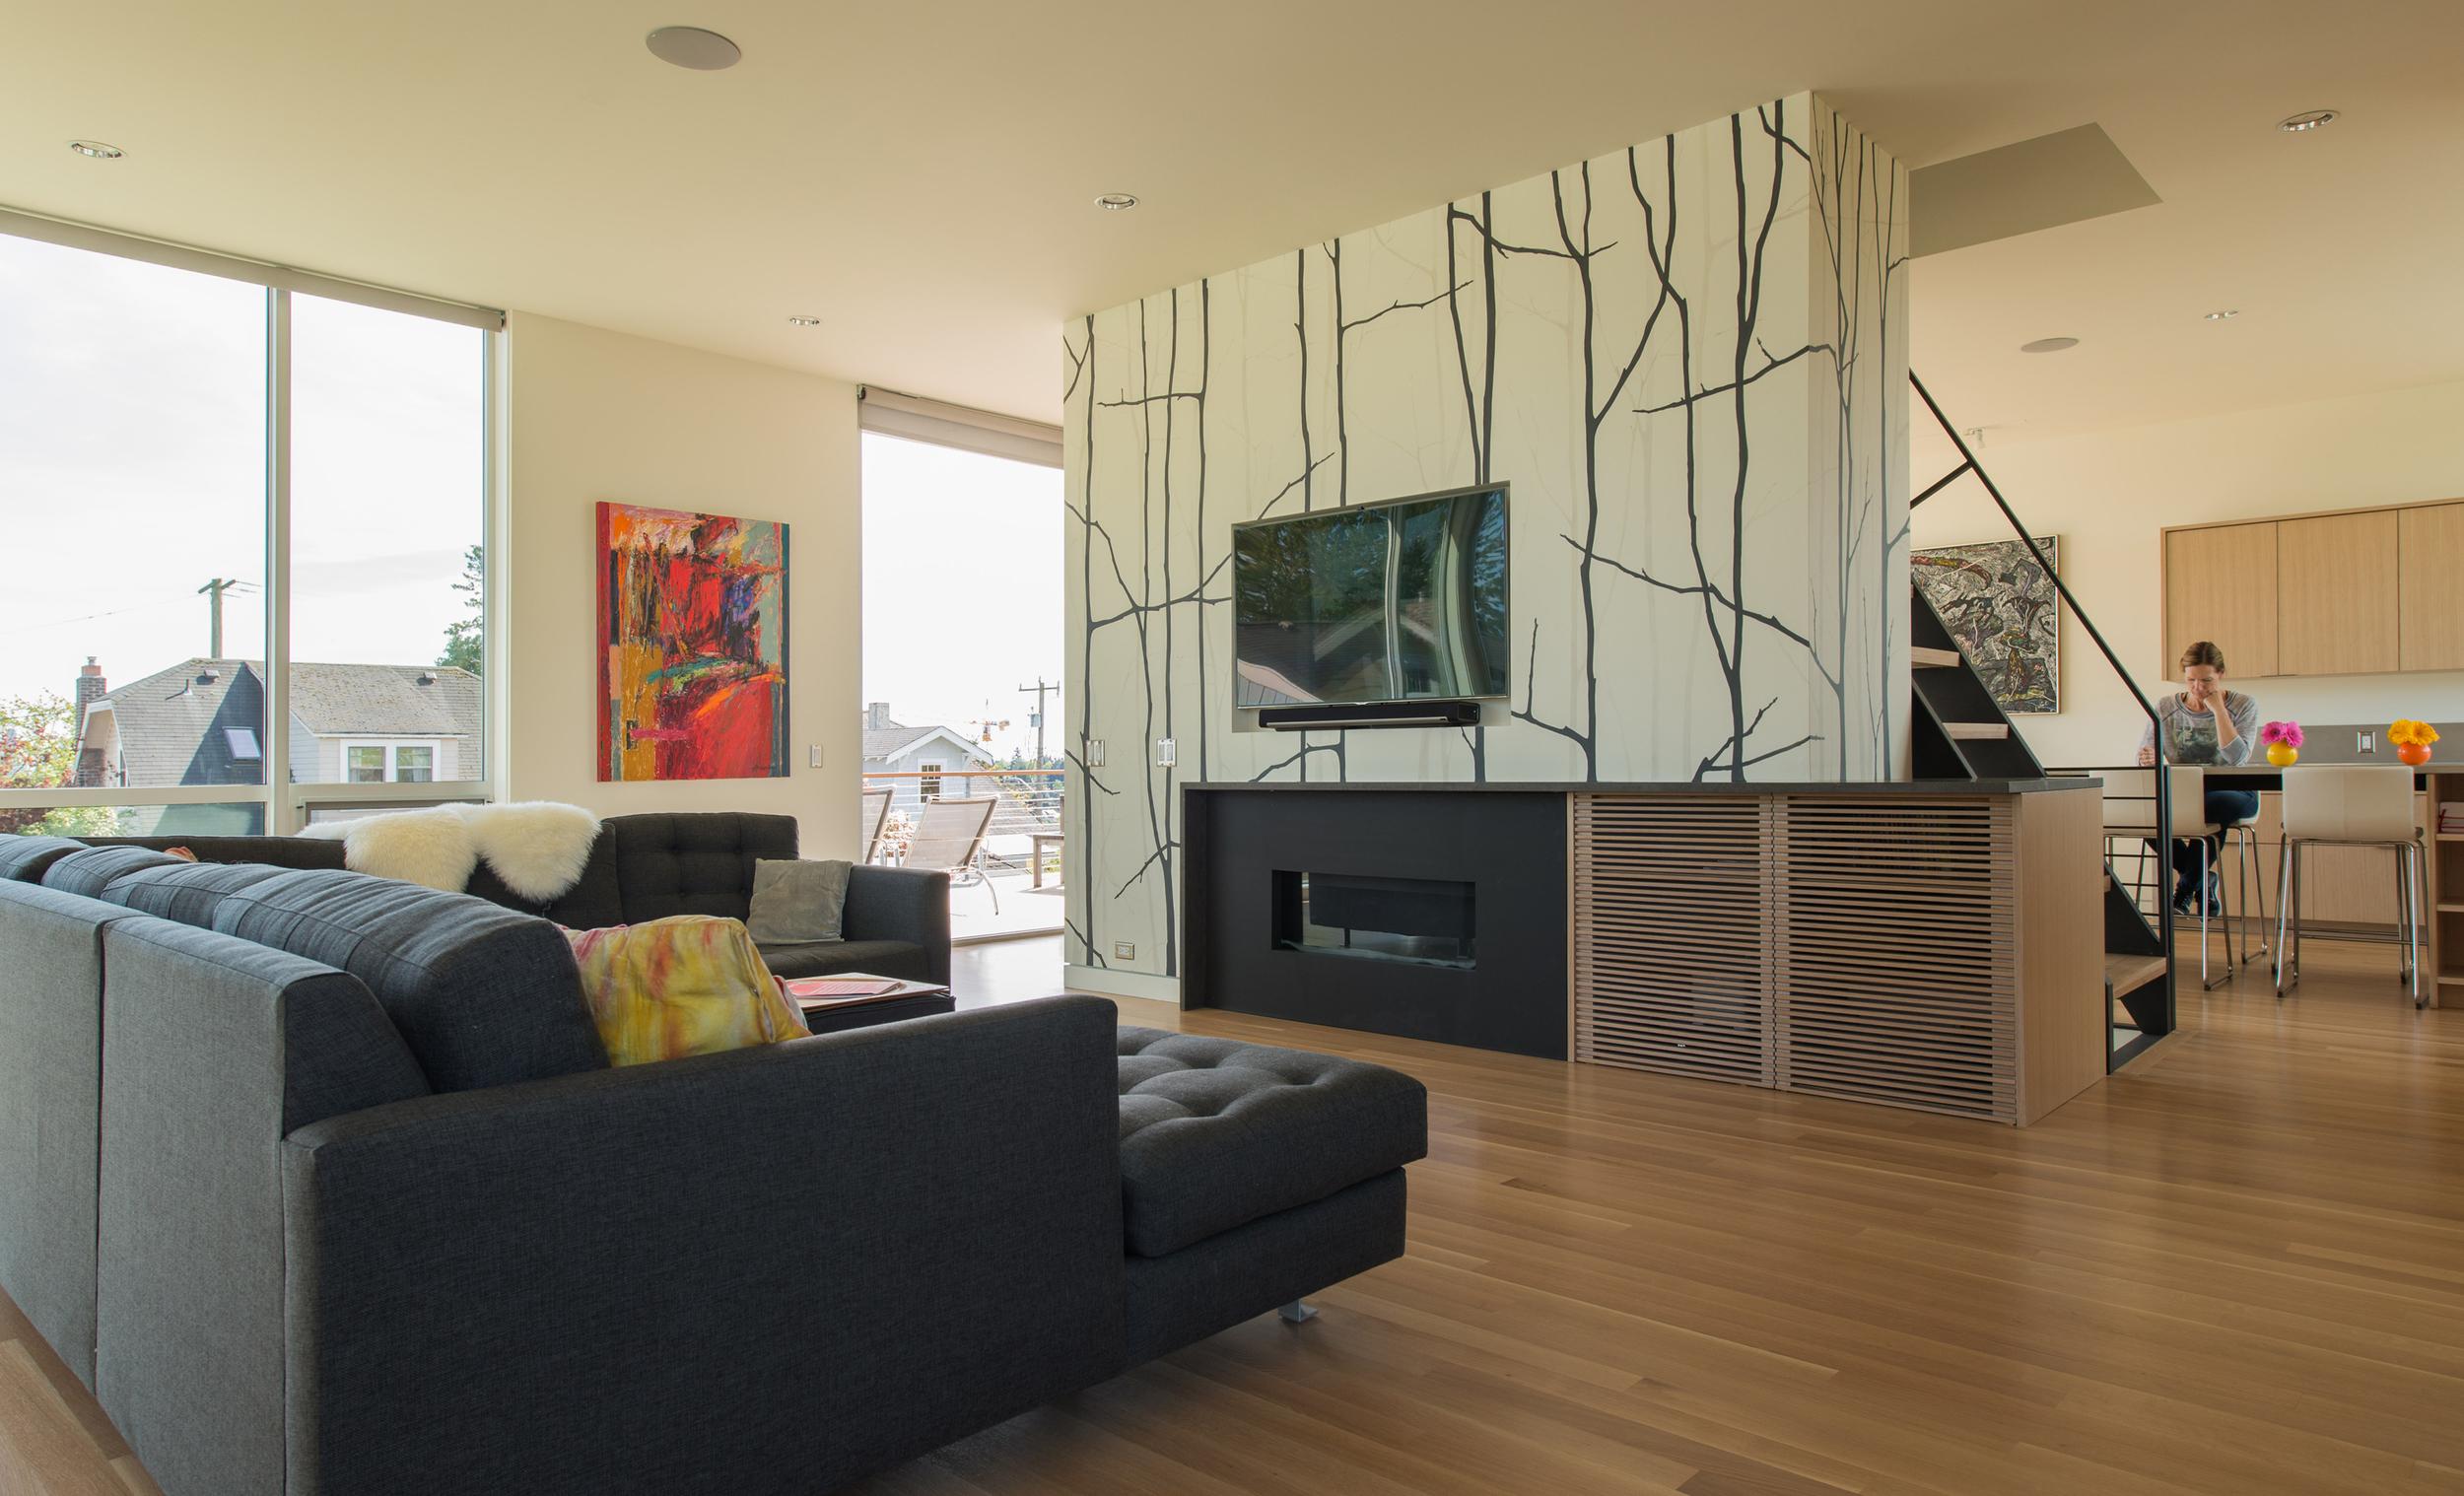 Image continues into living room. Photo by Andrew van Leeuwen, BUILD LLC